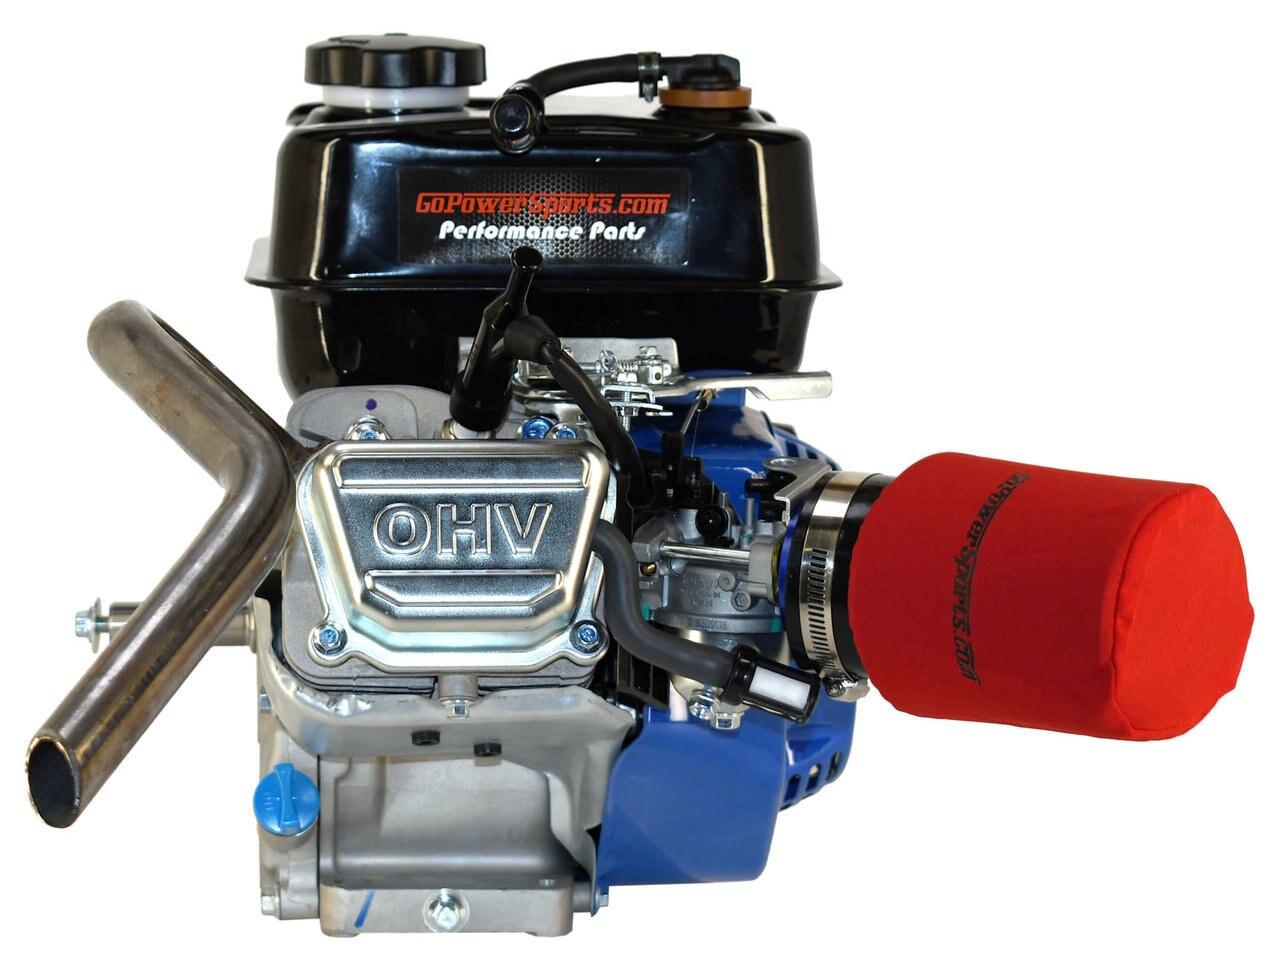 Stage 1: MB200 Performance Kit